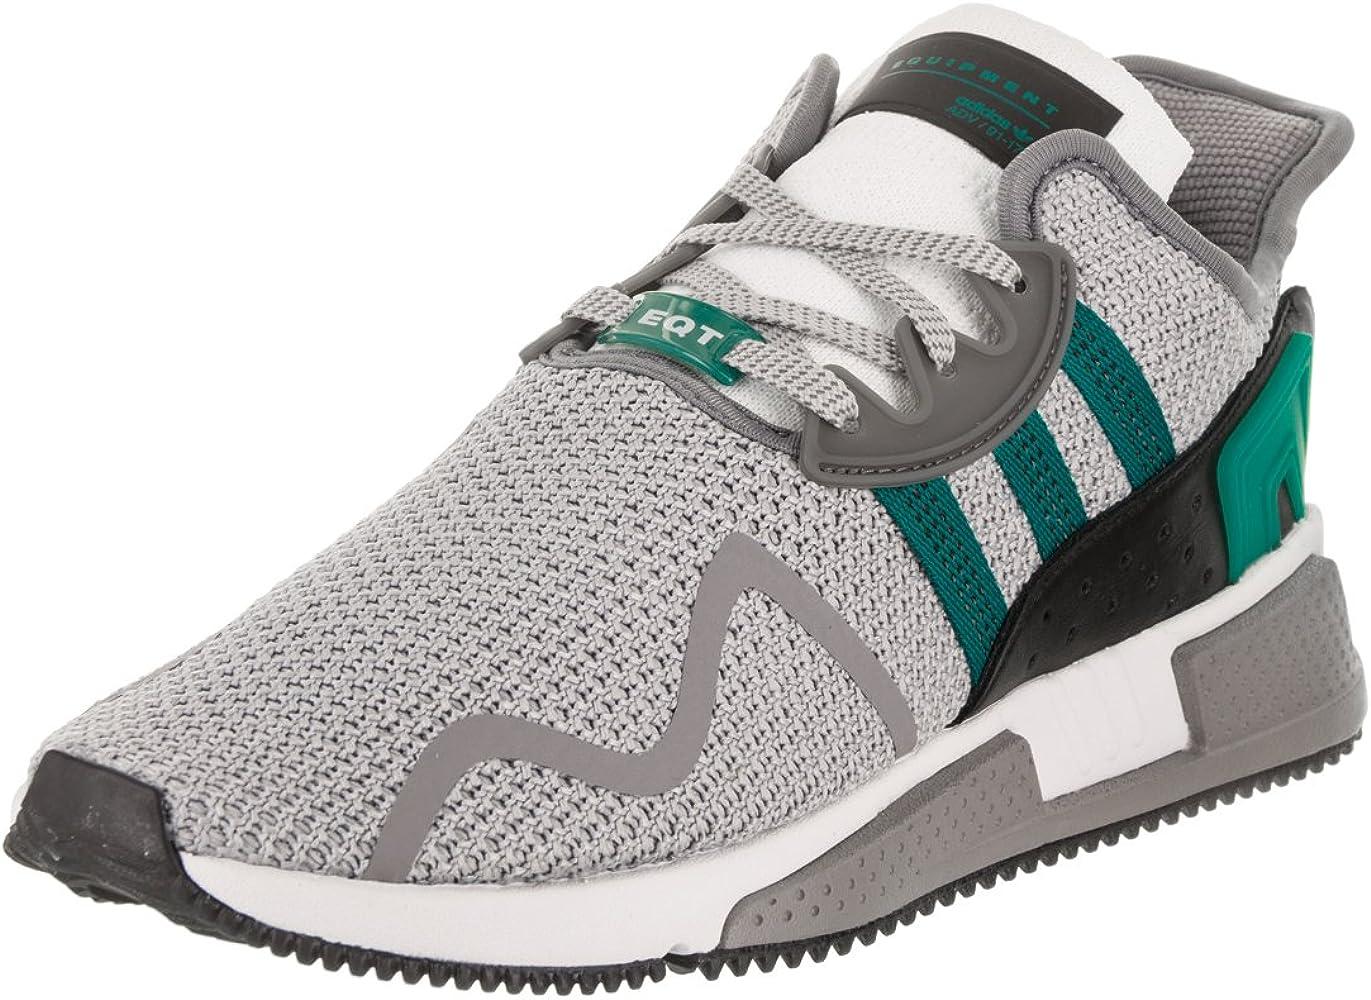 Adidas Originals Men's EQT ADV Grey White Green Basketball Shoes Size 11.5 D